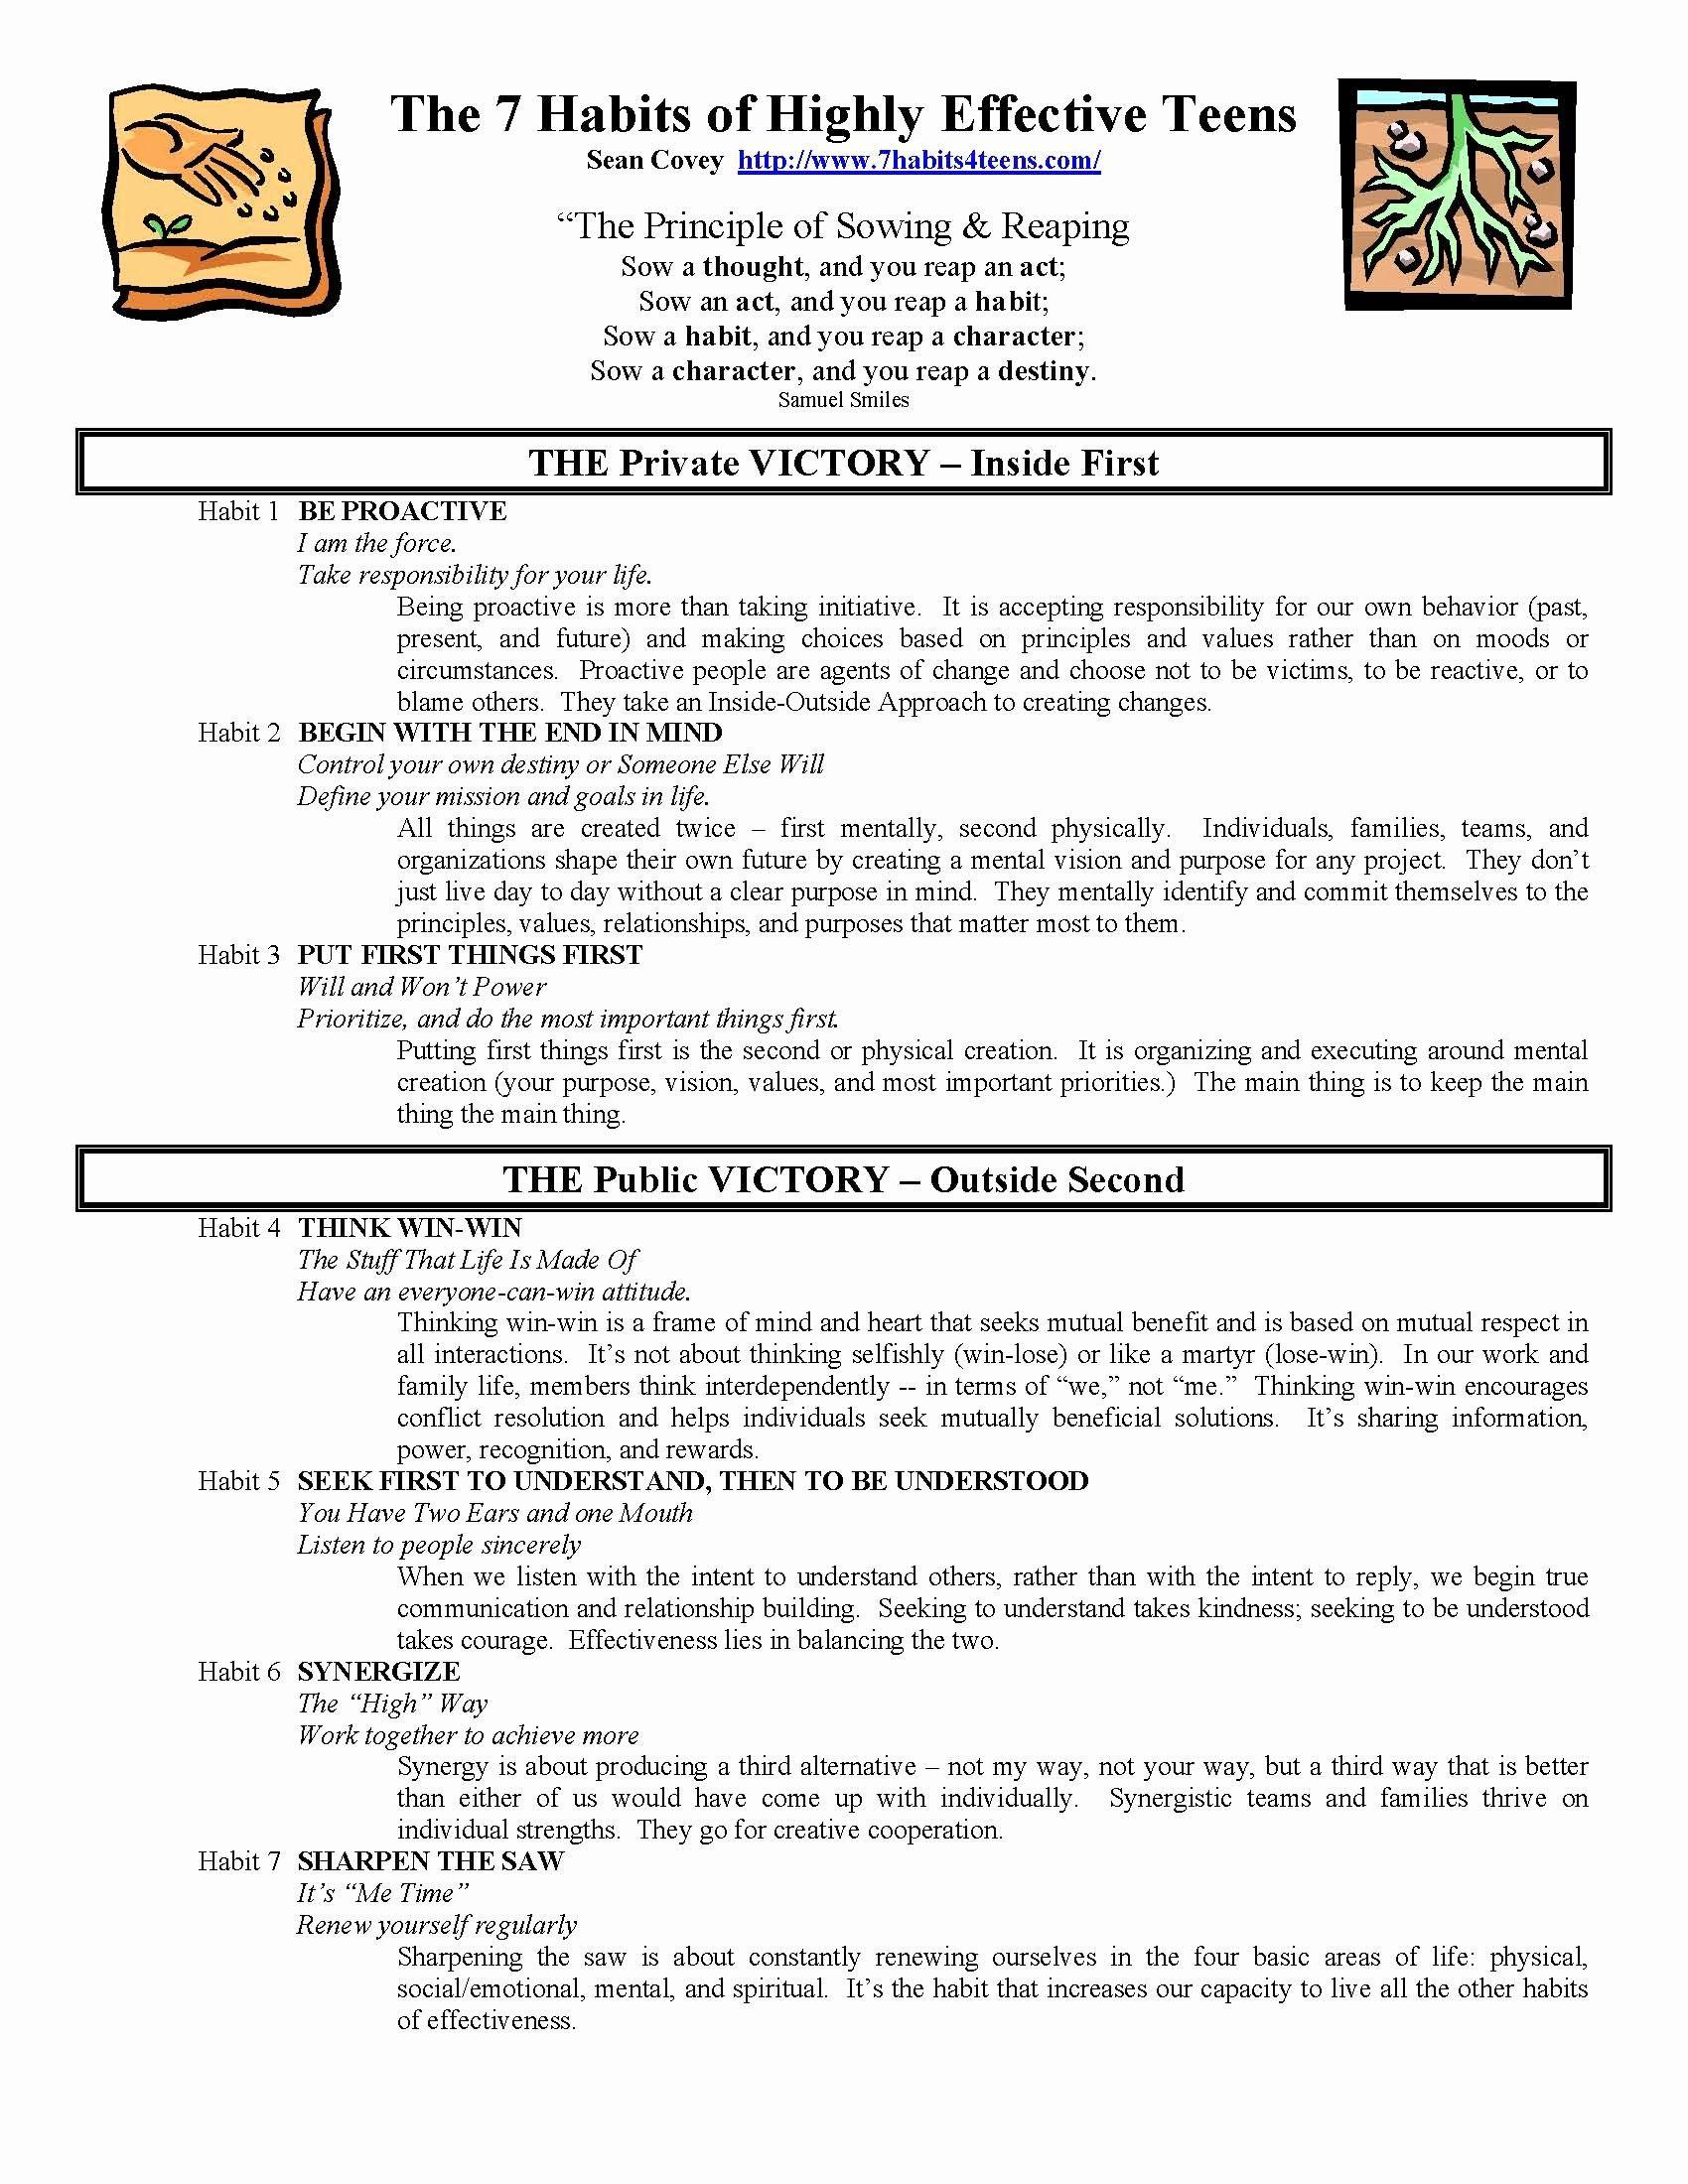 hight resolution of 7 Habits Worksheet Pdf Luxury 7 Habits Highly Effective Teens Worksheets  the Best   School organization for teens